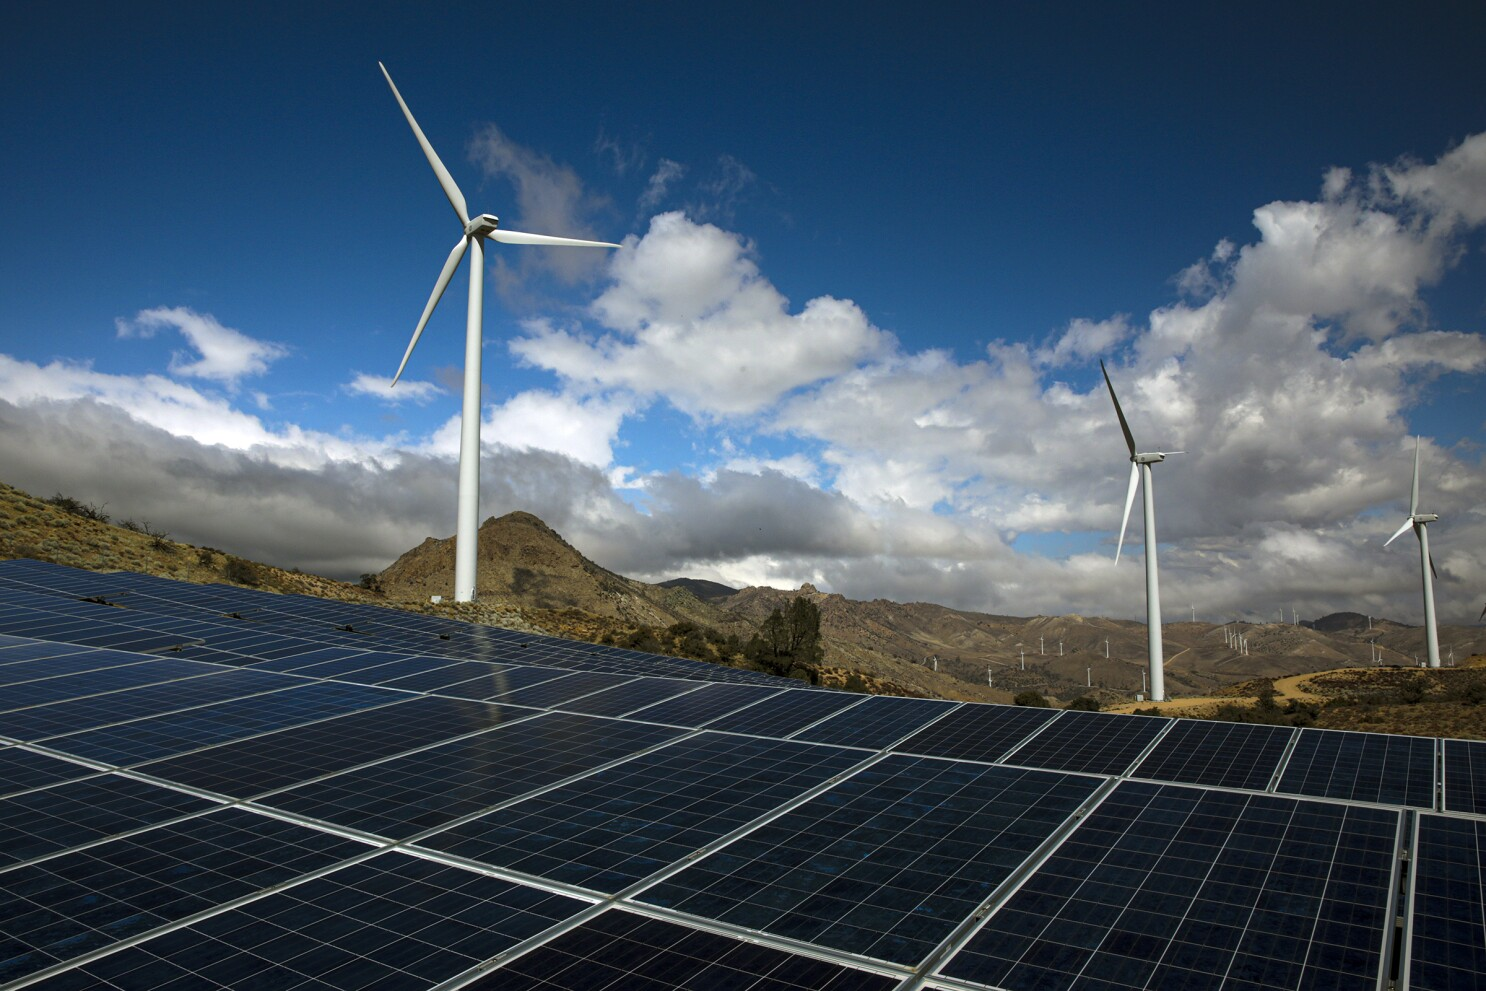 La Clean Energy Plan Cut Natural Gas Fight Climate Change Los Angeles Times